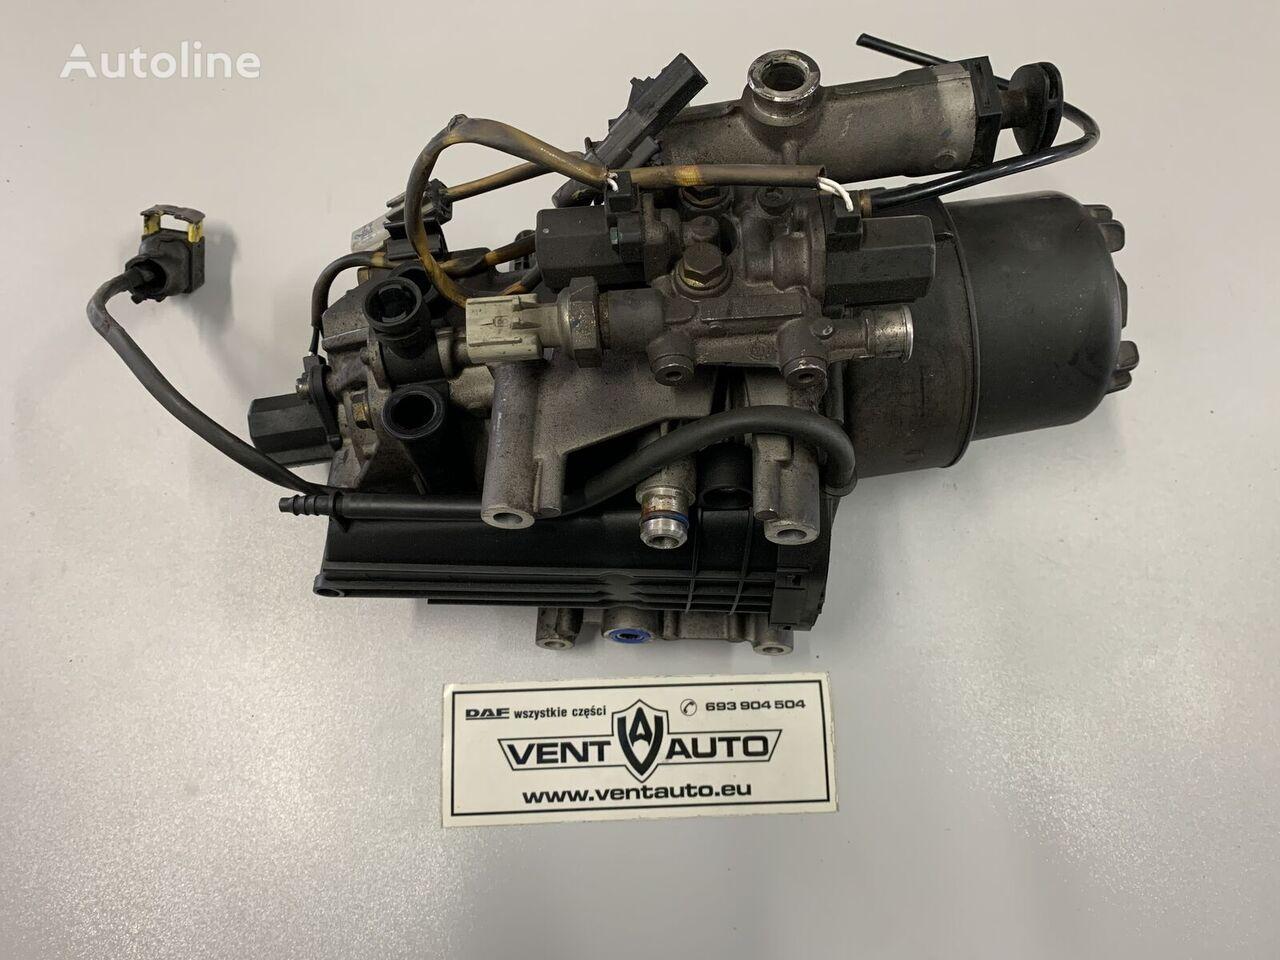 корпус топливного фильтра DAF XF 106 для тягача DAF XF 106